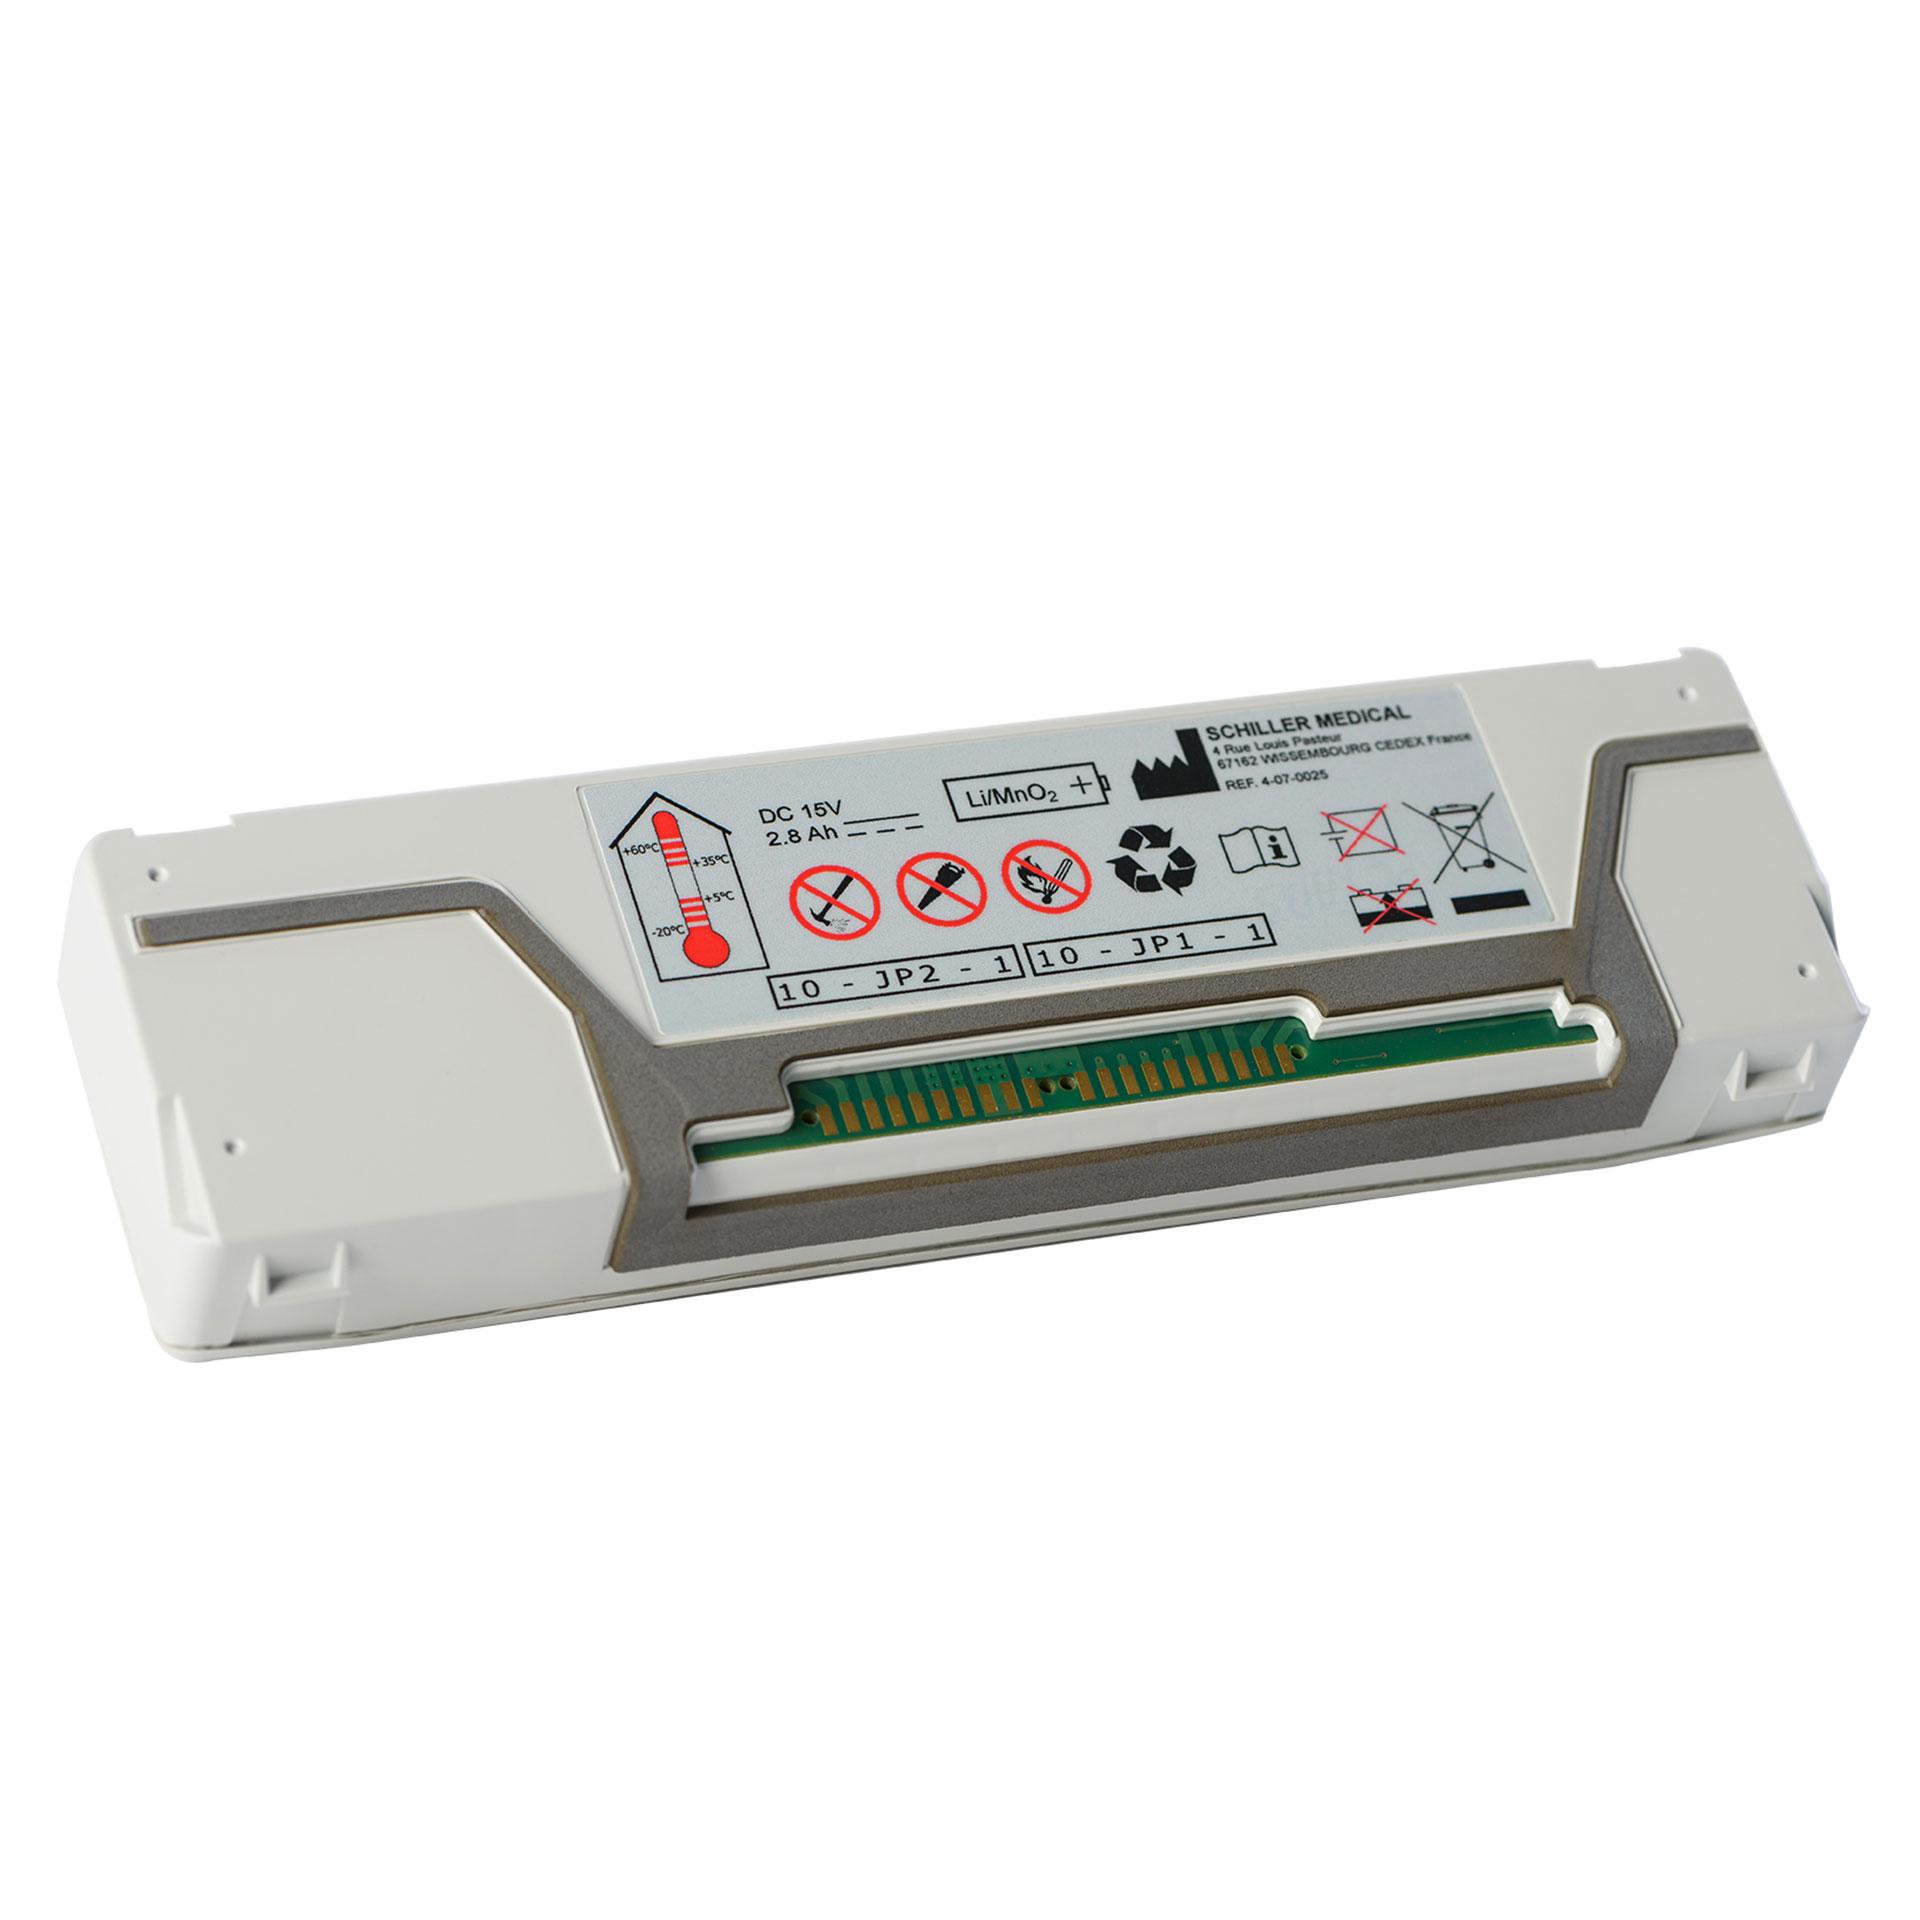 Batterie für FRED PA-1